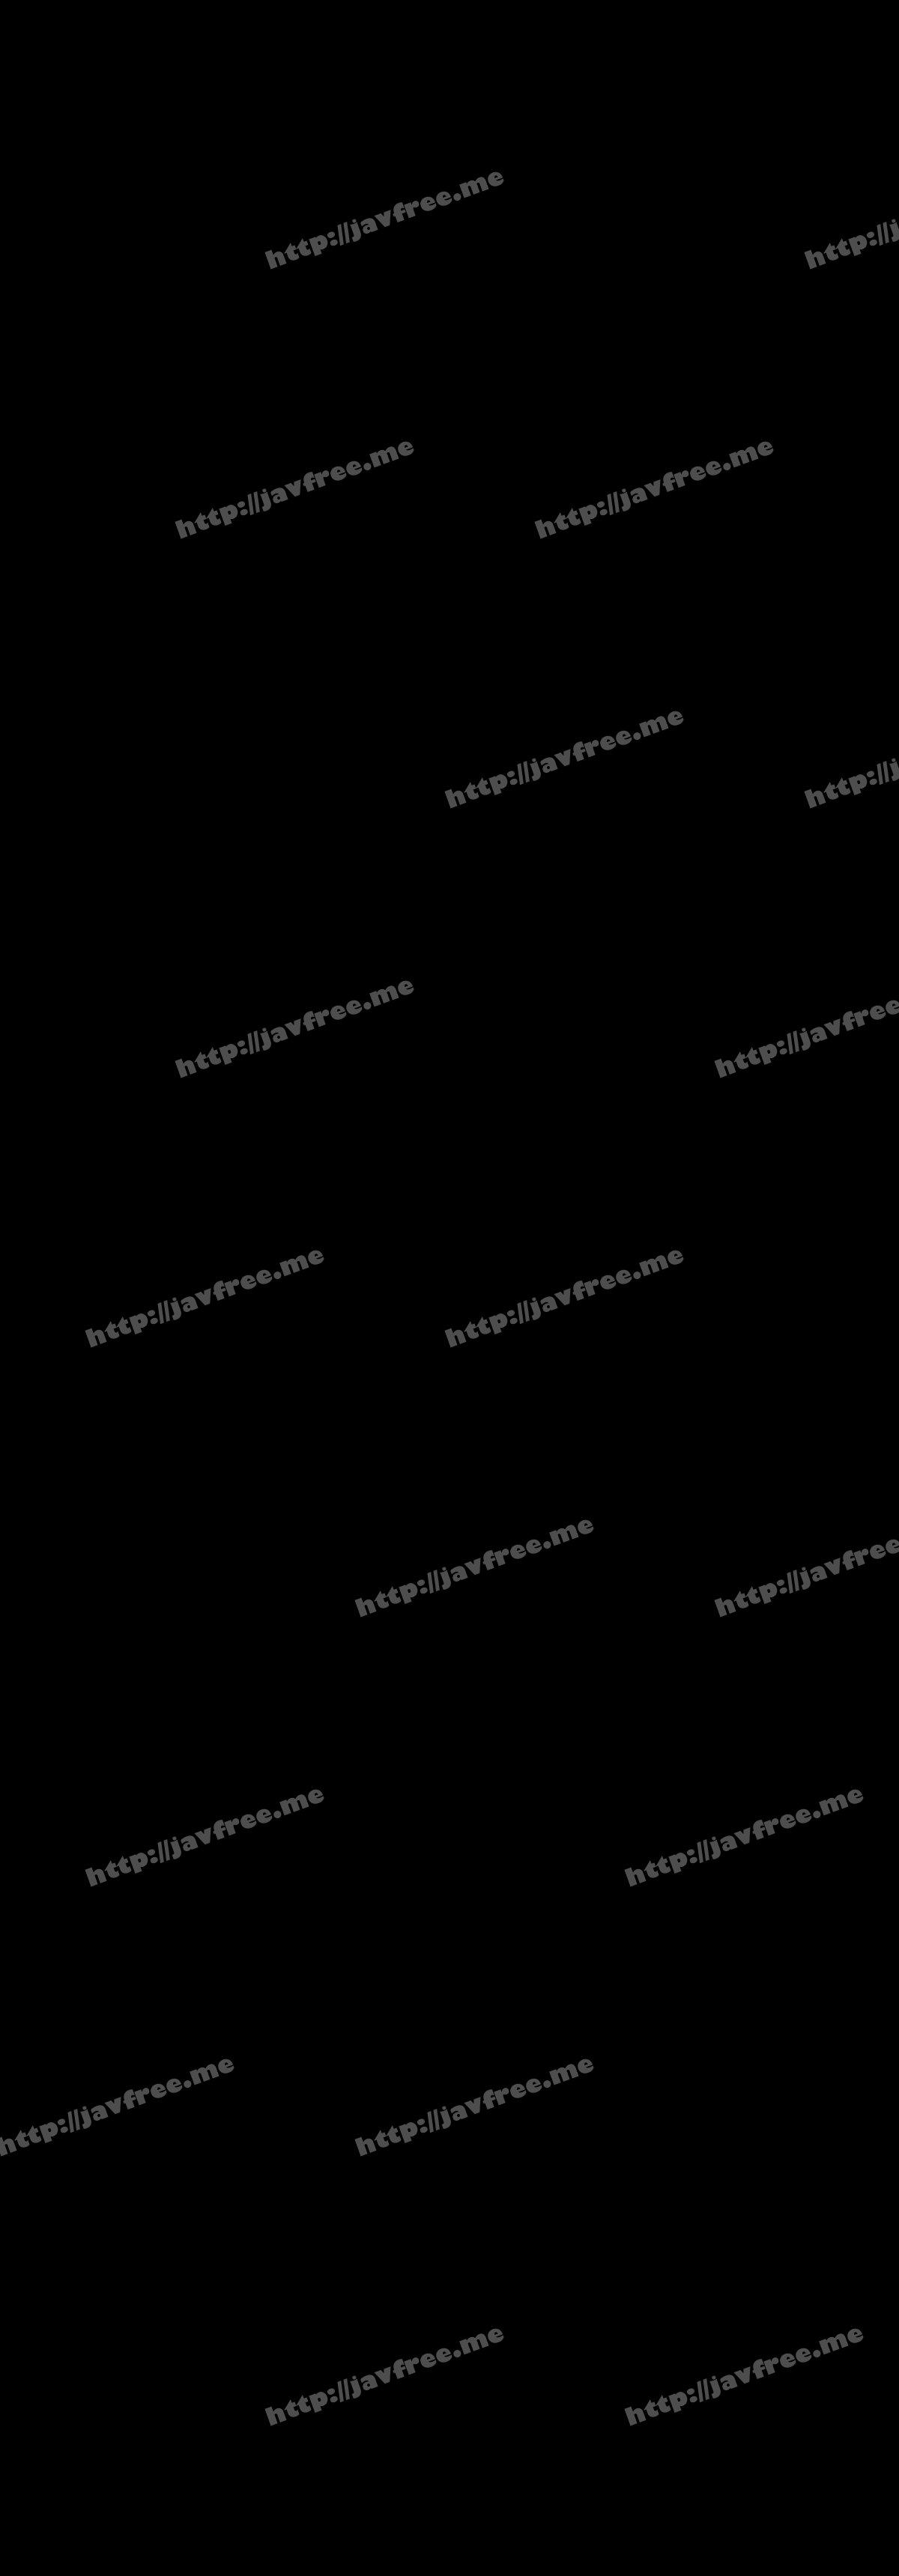 [HD][DNJR-007] 星奈あいのM男拉致監禁 調教物語 - image DNJR-007-1080p on https://javfree.me